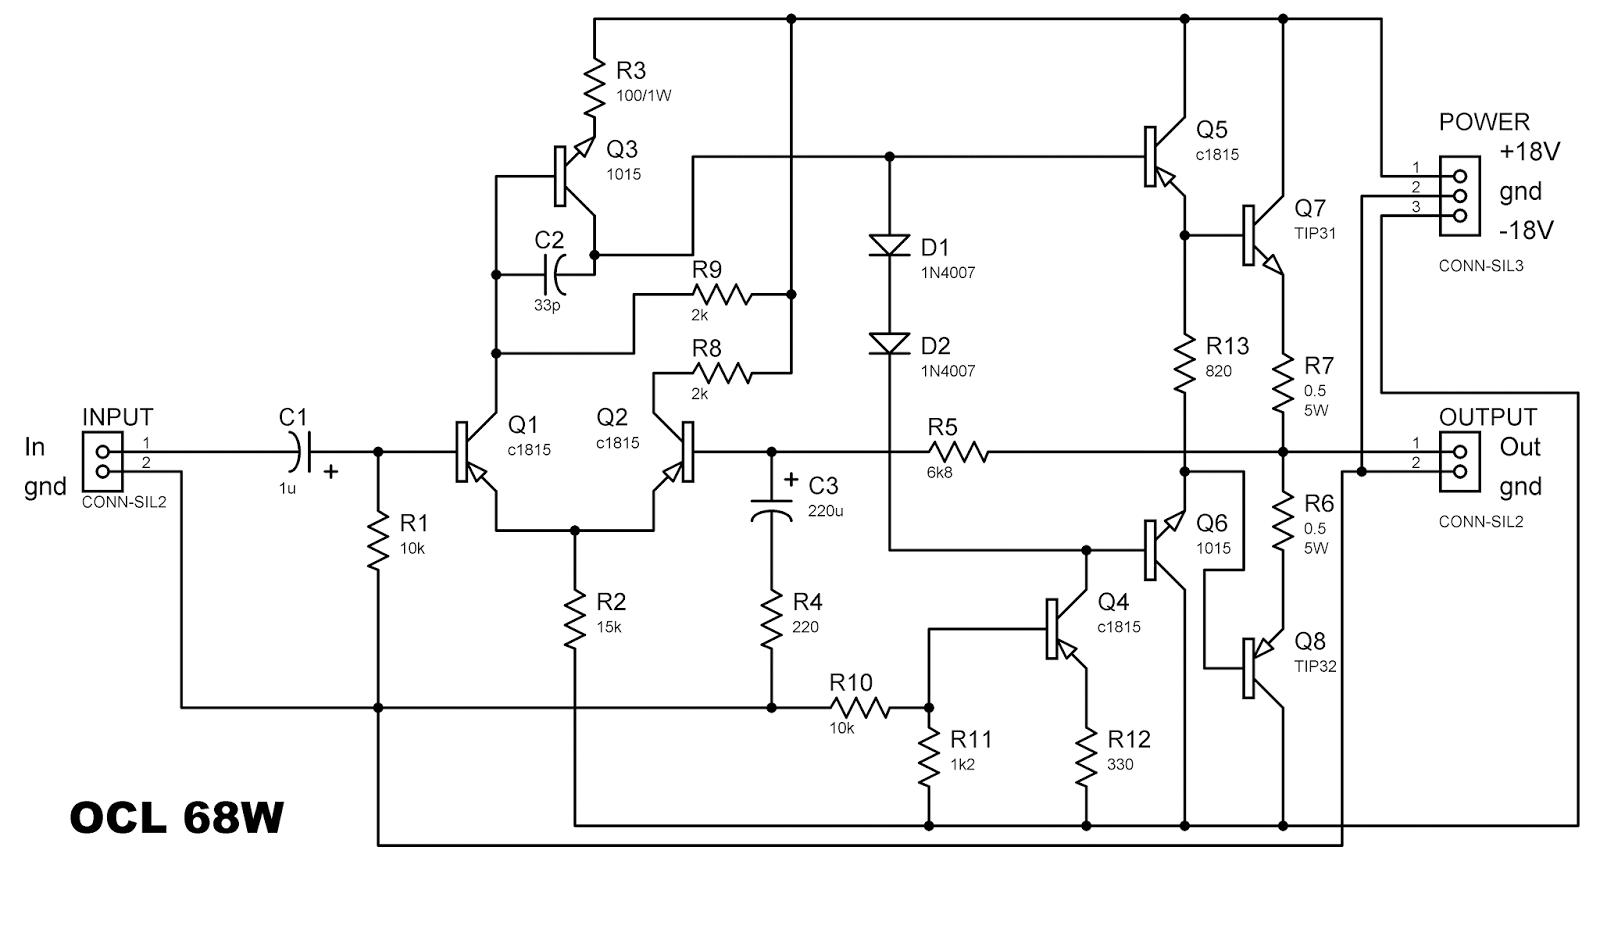 Audio Amplifier Circuit Diagram With Layout 1967 Jeep Cj5 Wiring Dc 12 Volt 3055 Best Library Ocl 68 Watt Power Design